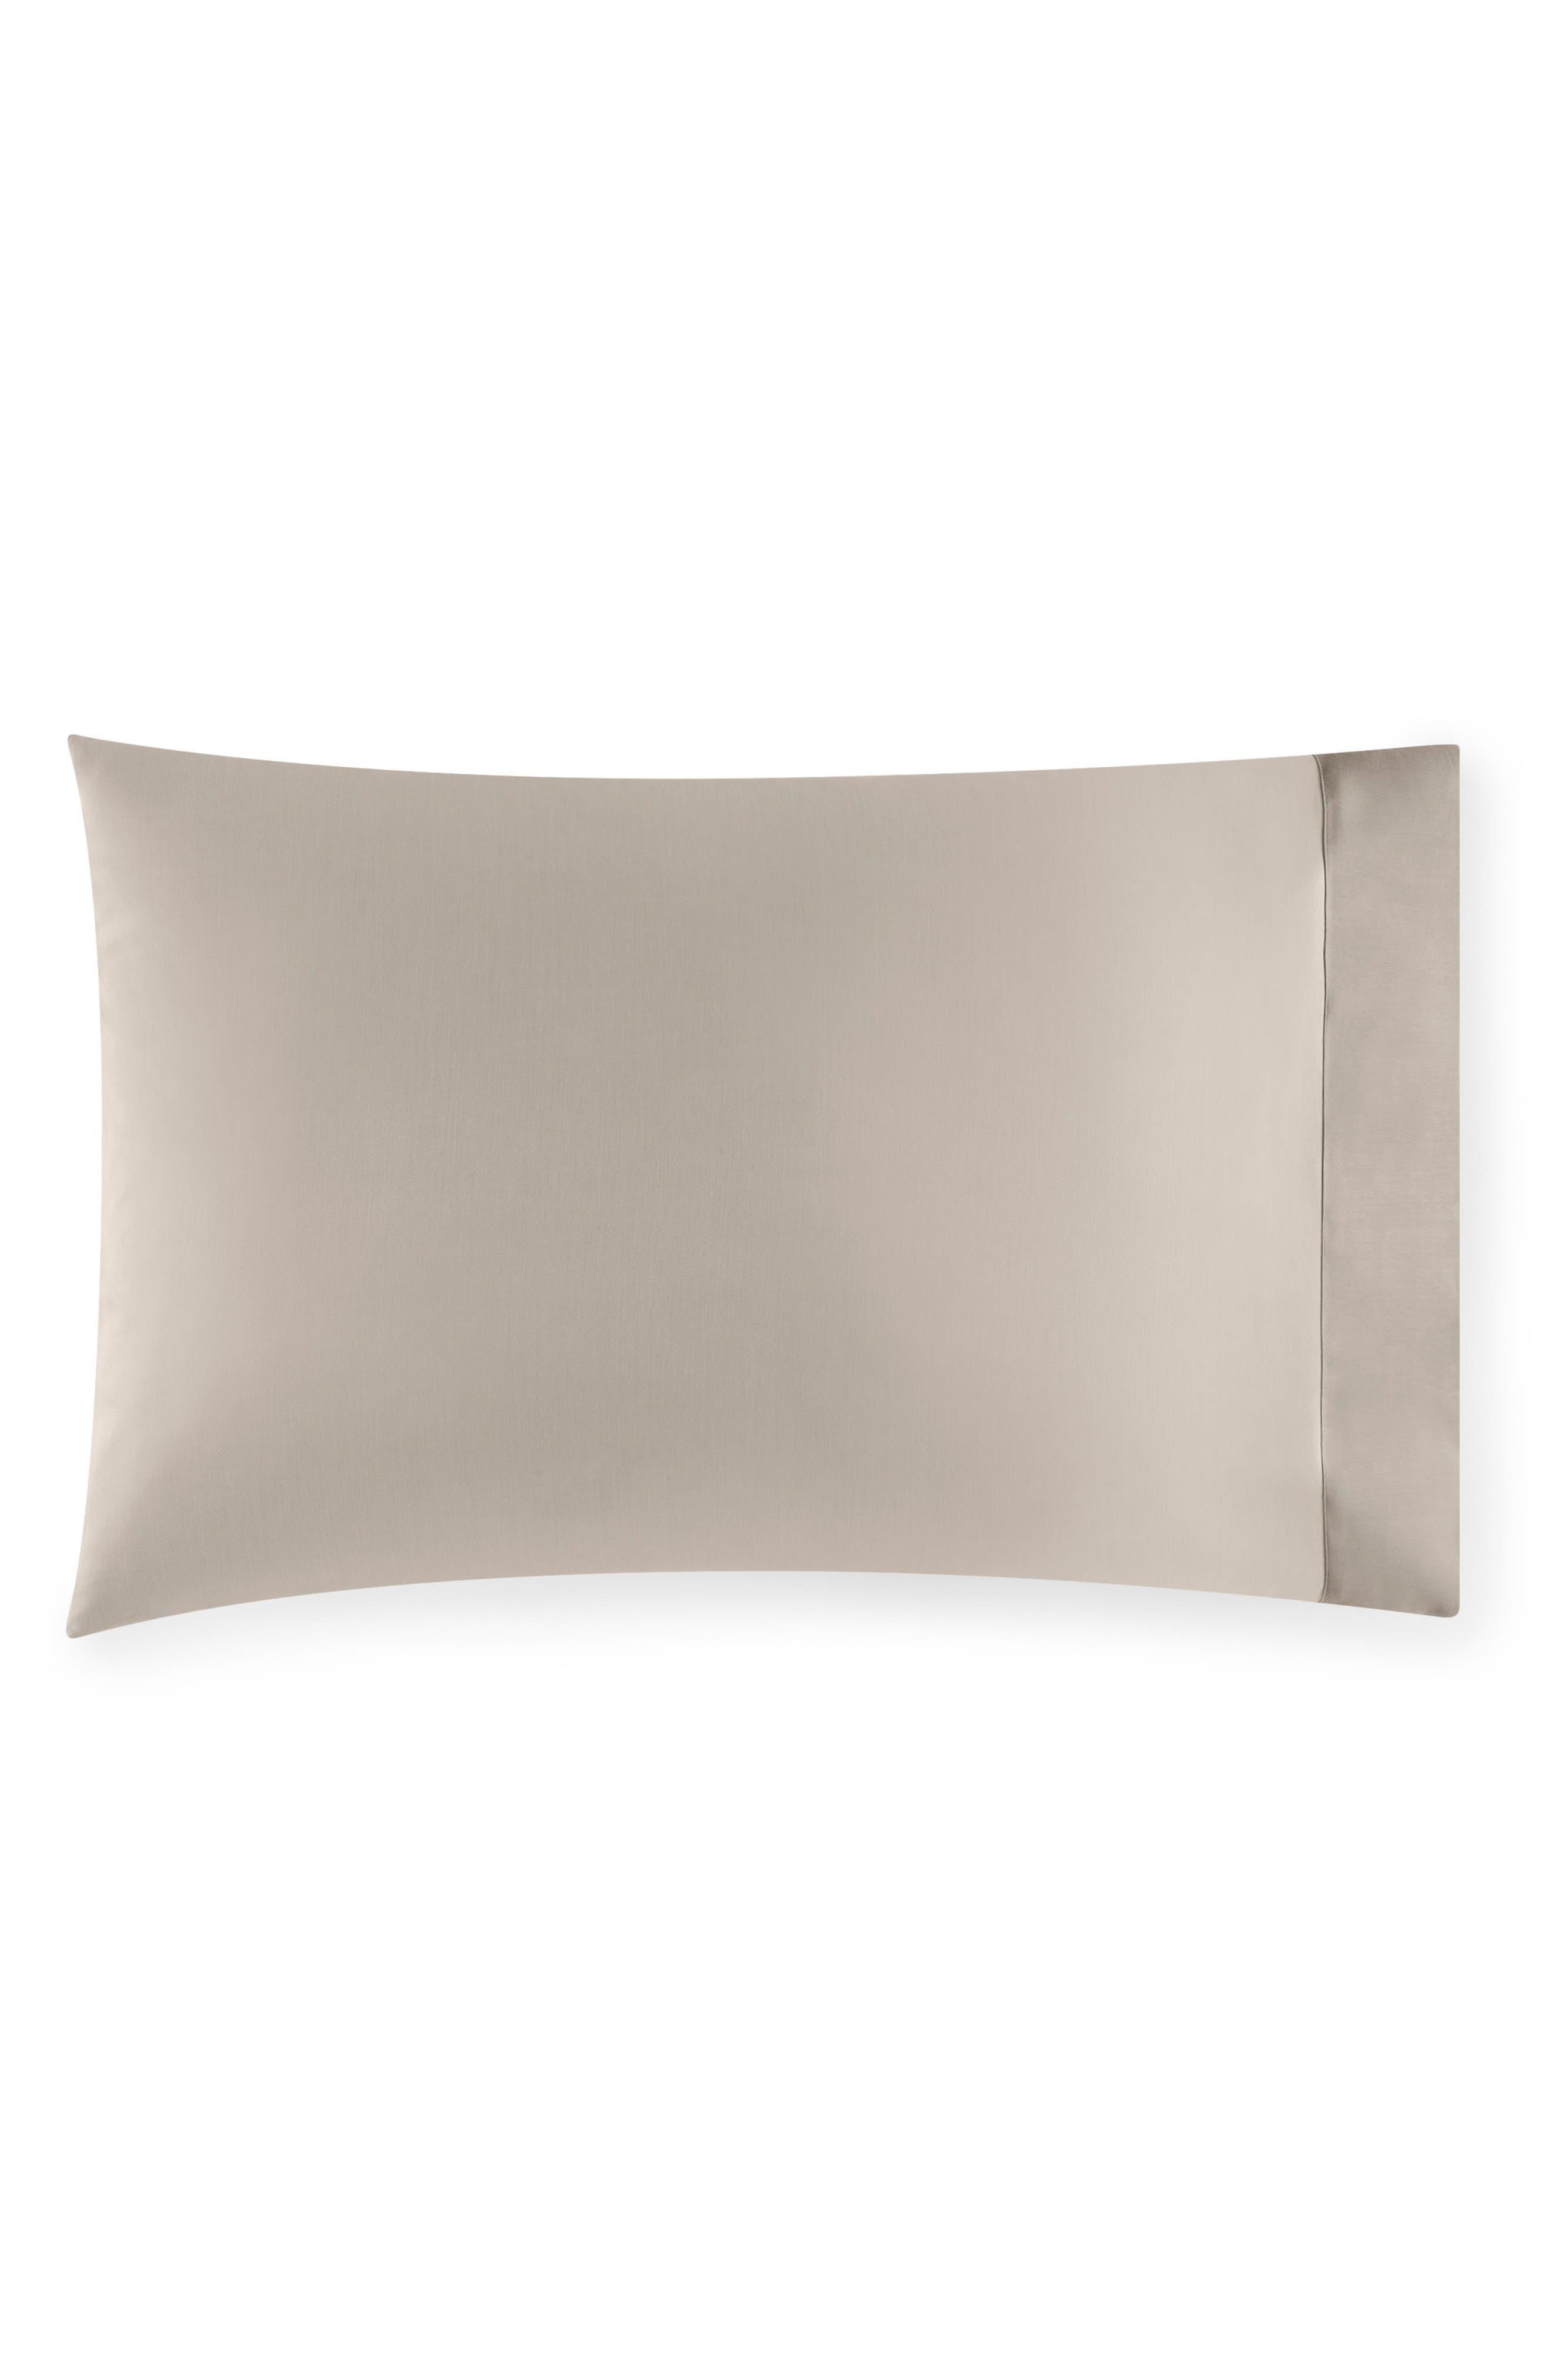 Main Image - SFERRA Larro Pillowcase